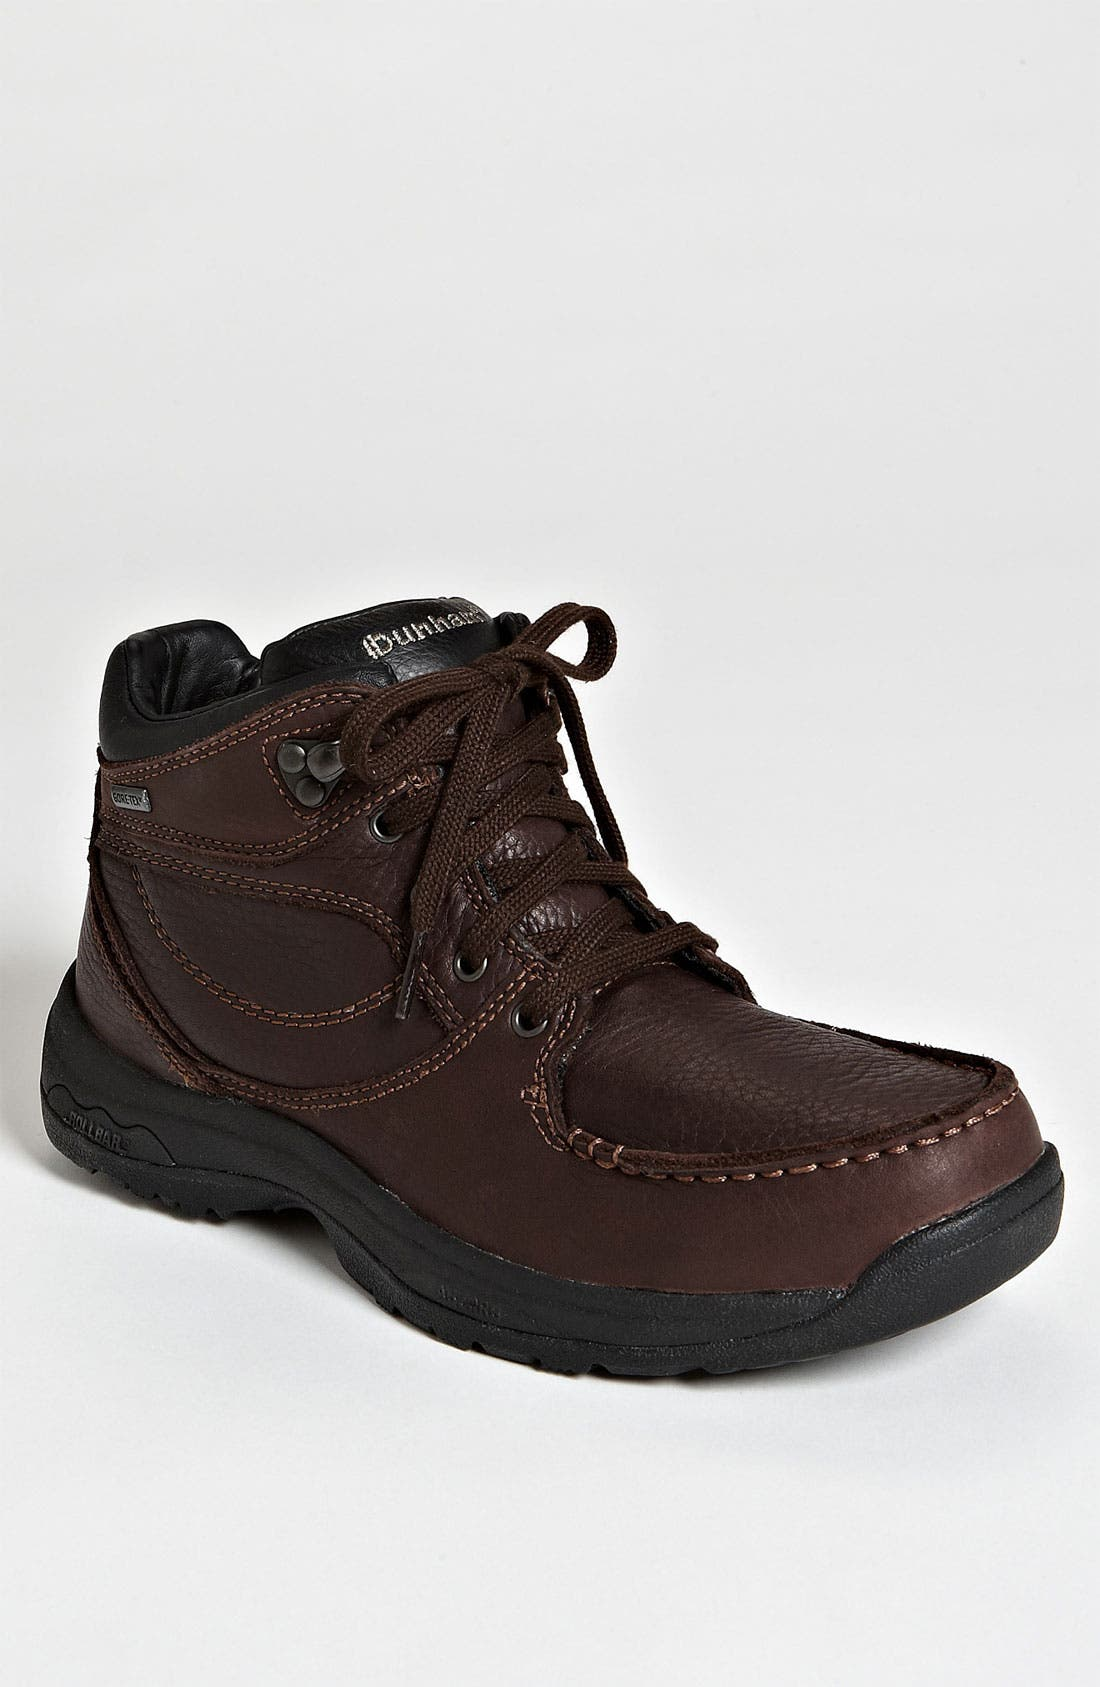 Alternate Image 1 Selected - Dunham 'Incline' Boot